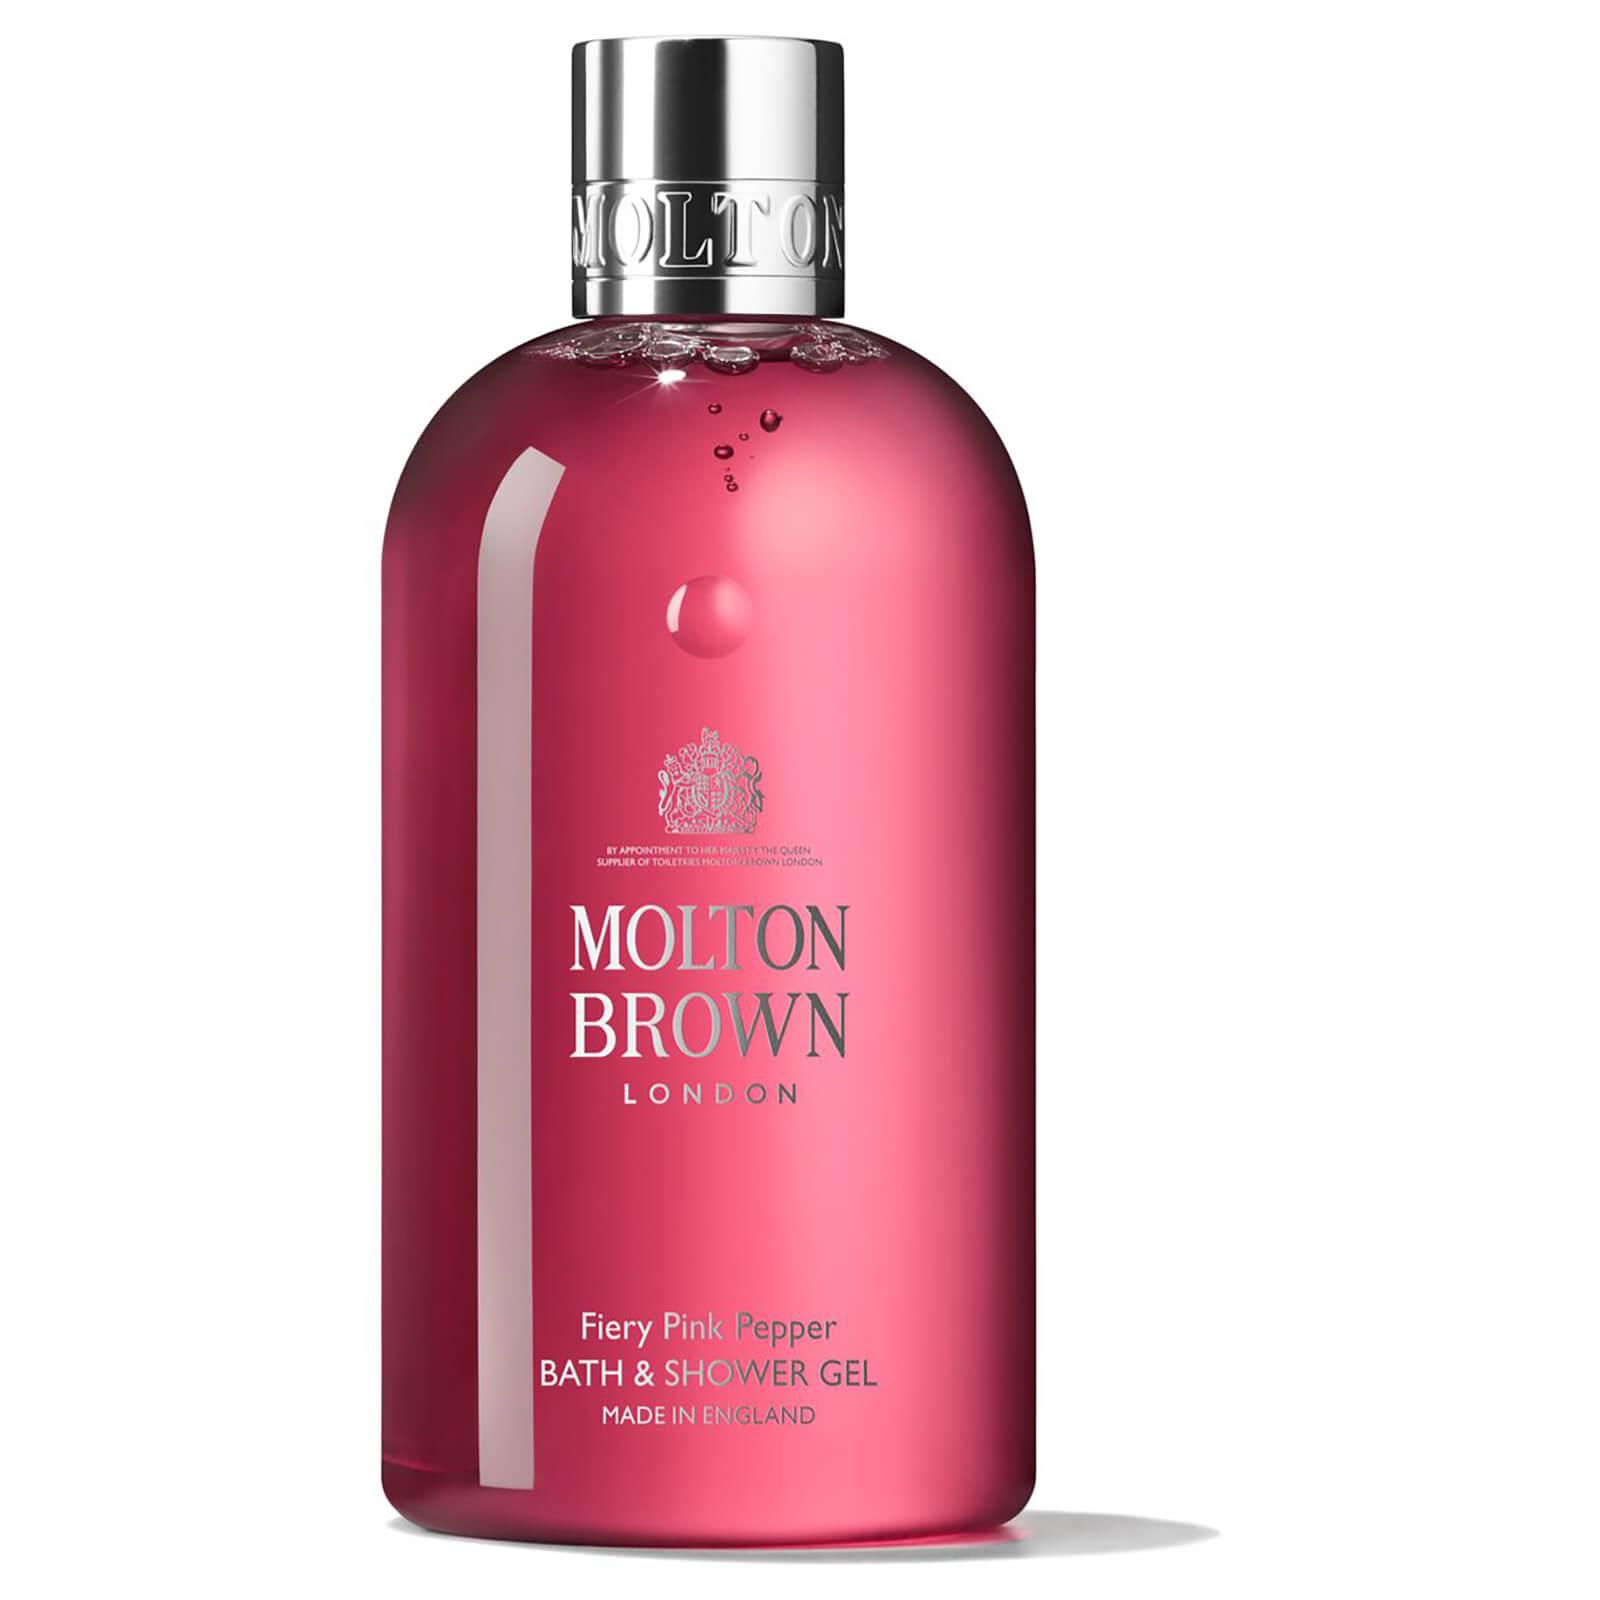 Molton Brown Pink Pepperpod gel douche du poivre rose